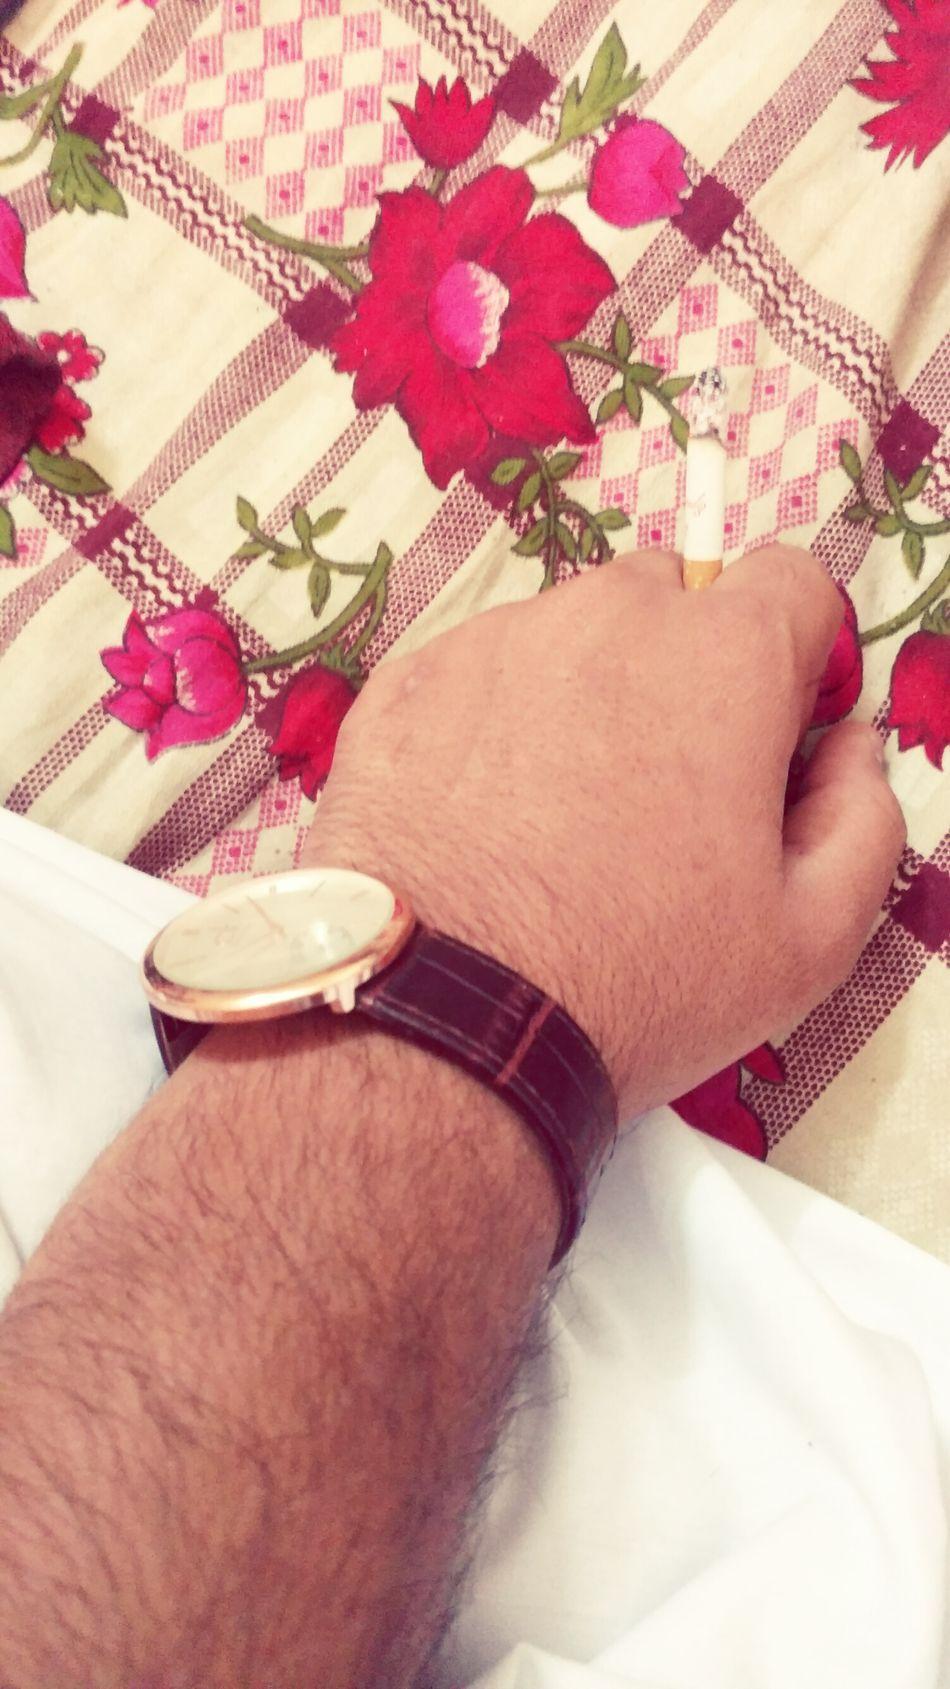 My Hand  Ciggarette ⌚️ Watch Smoking ✌✌